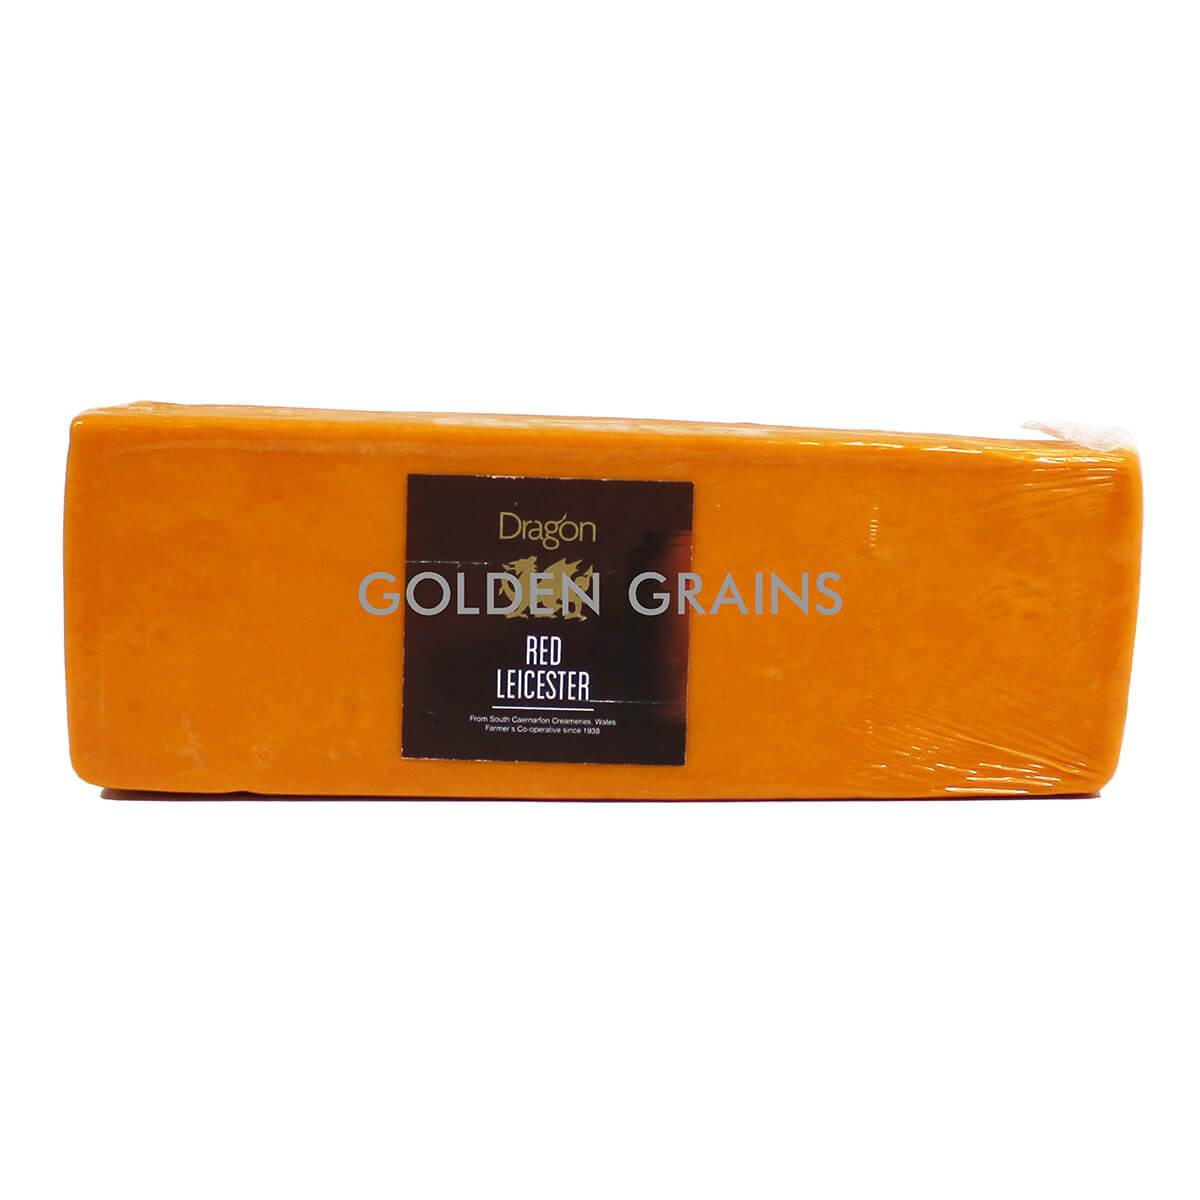 Golden Grains Dubai Export - Dragon Red Leicester - Front.jpg